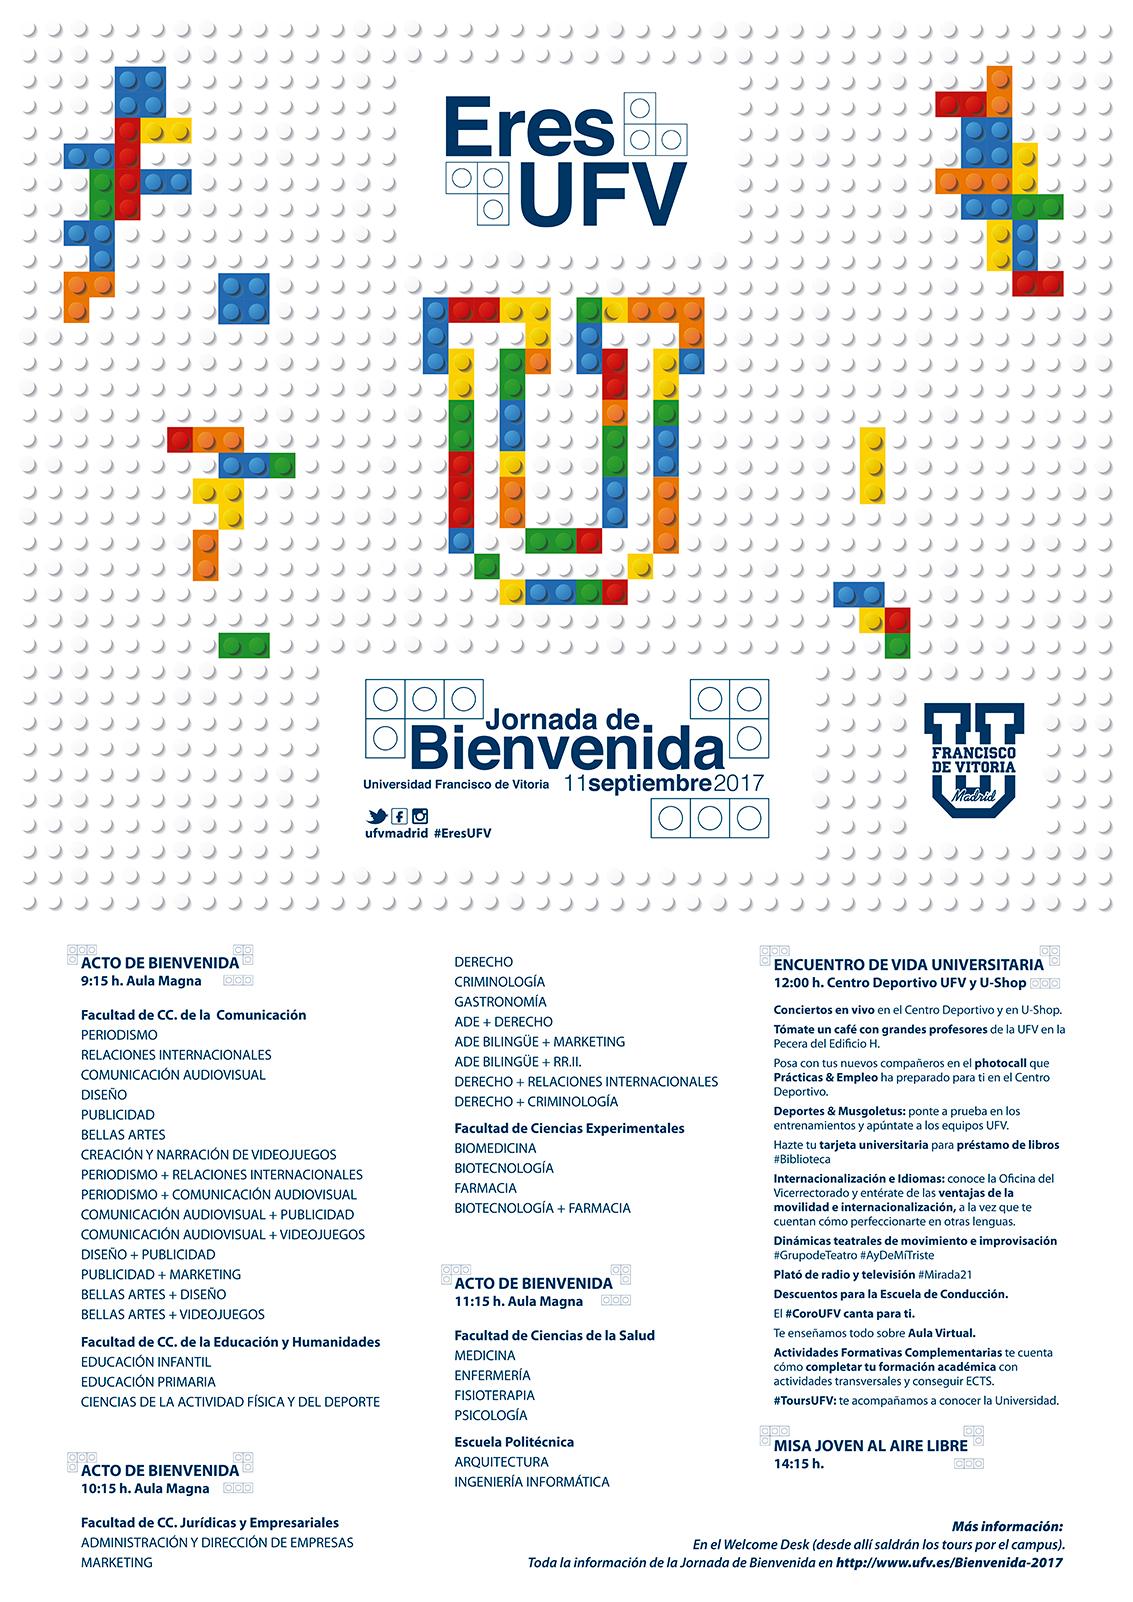 Jornada de bienvenida 2017 - Programa